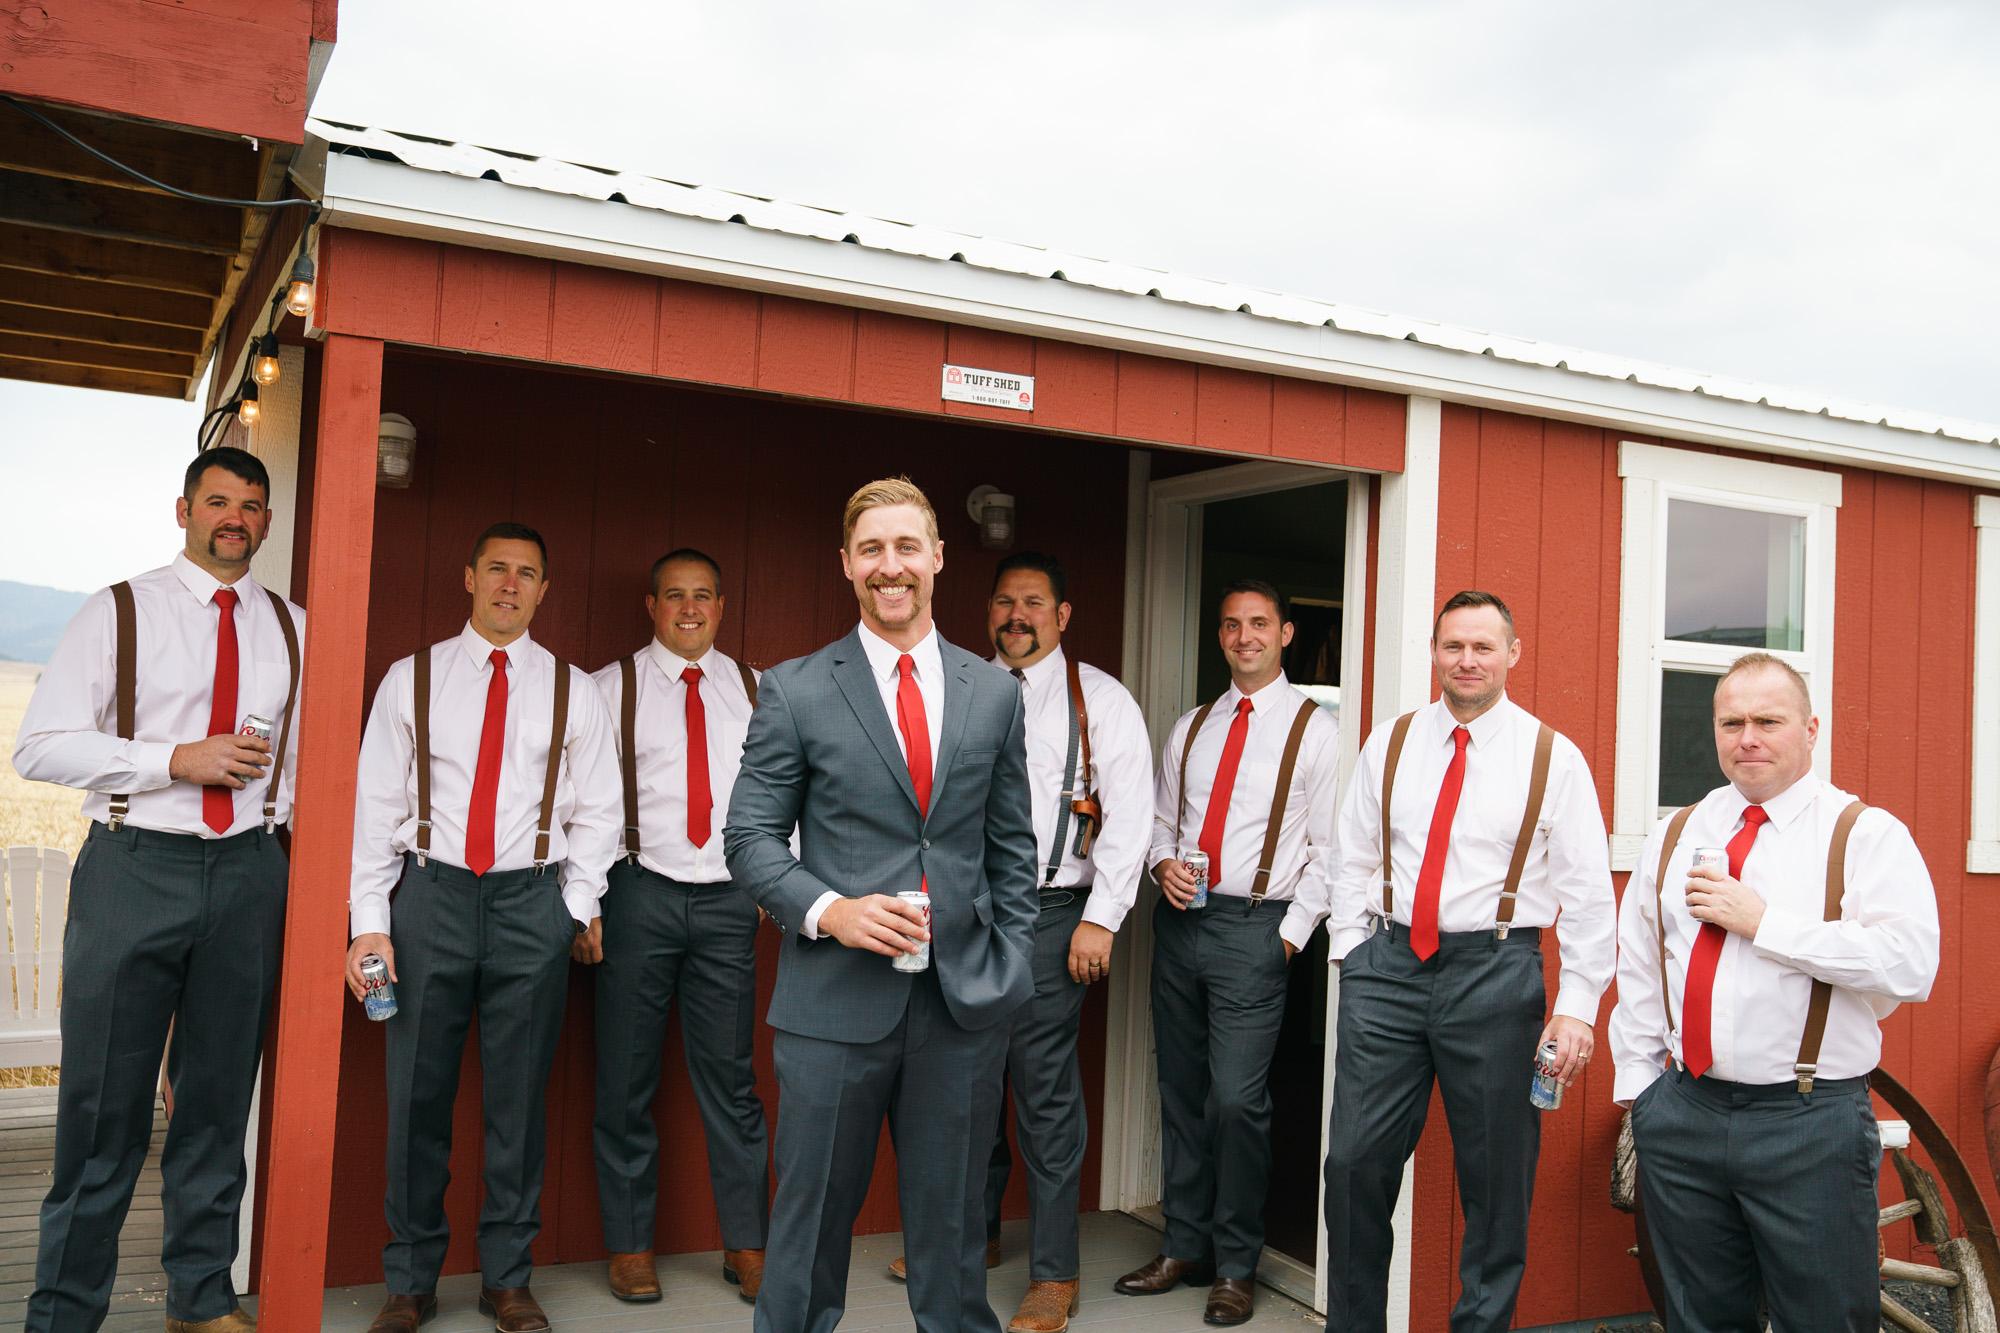 groomsman in the barn image spokane rea lwedding